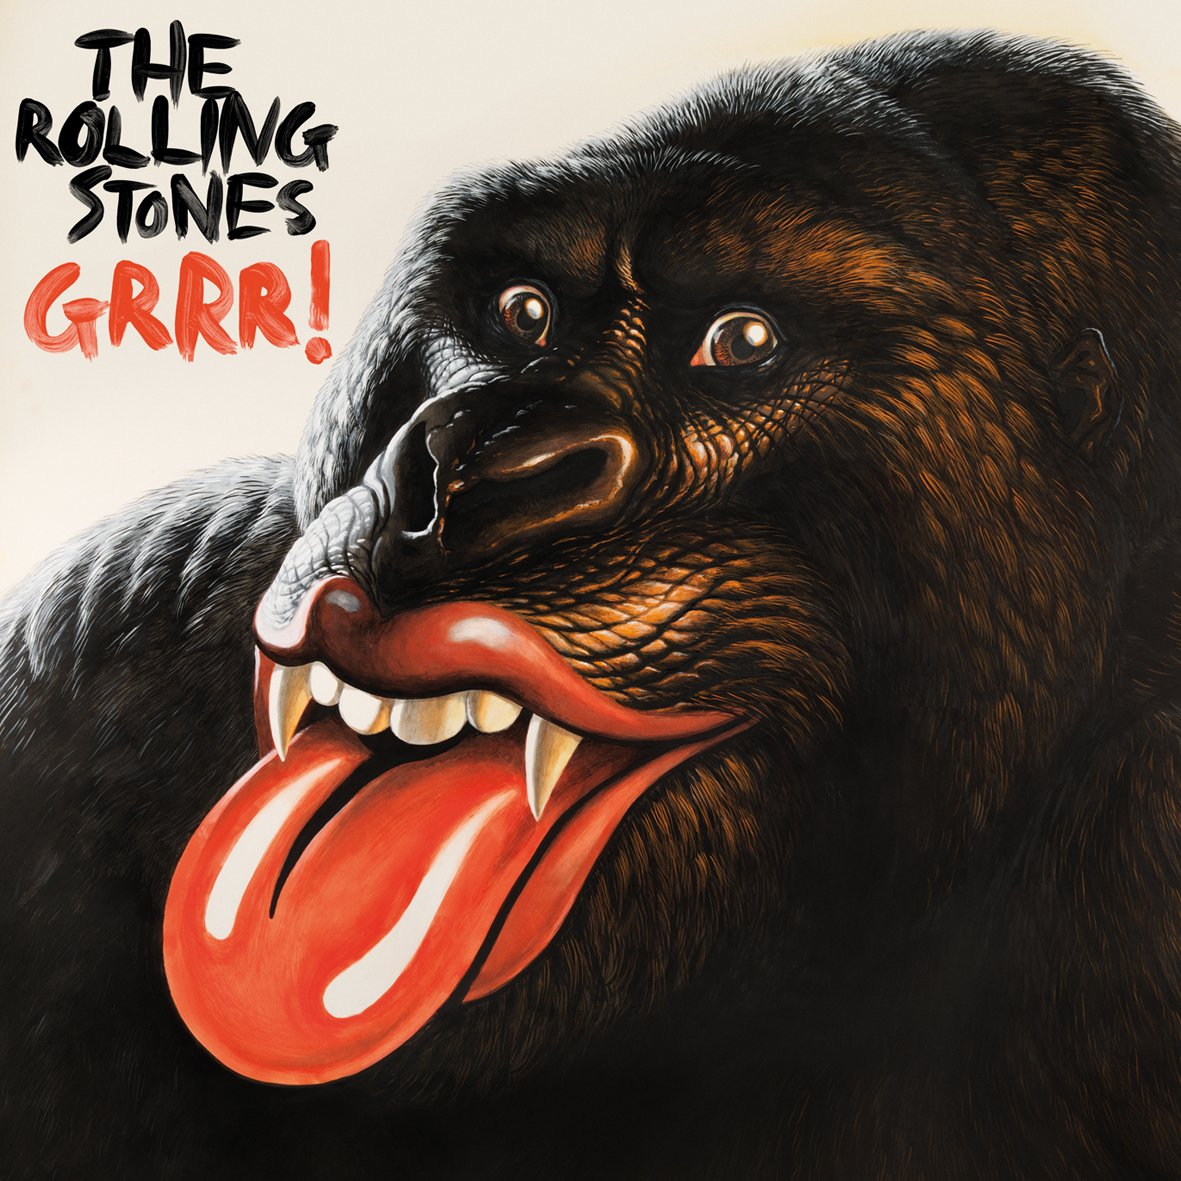 Grrr! Greatest Hits (5lp) [Analog]                                                                                                                                                                                                                                                                                                                                                                                                <span class=